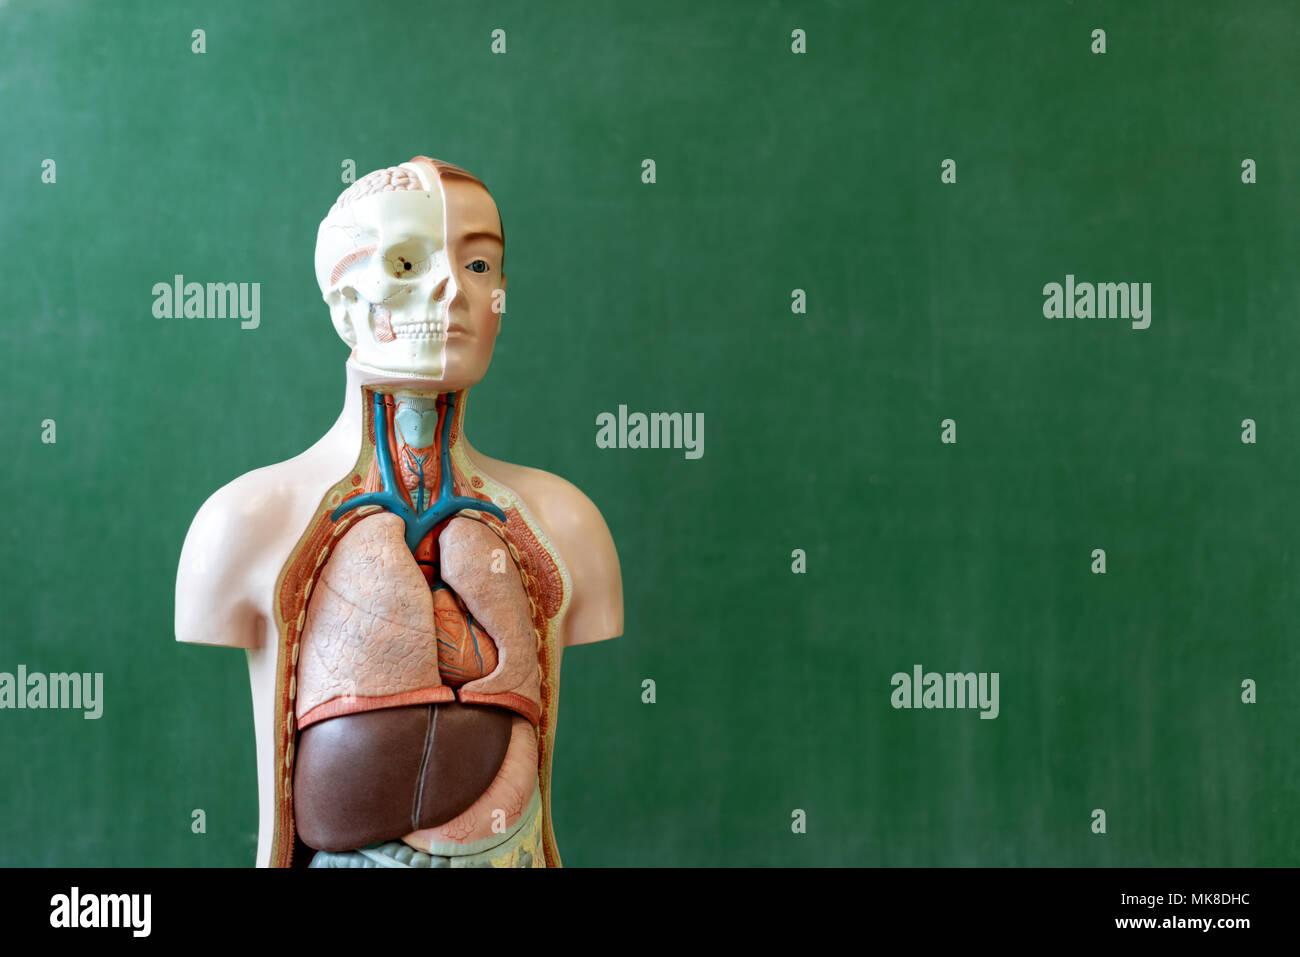 Artificial Human Body Model Biology Class Anatomy Teaching Aid